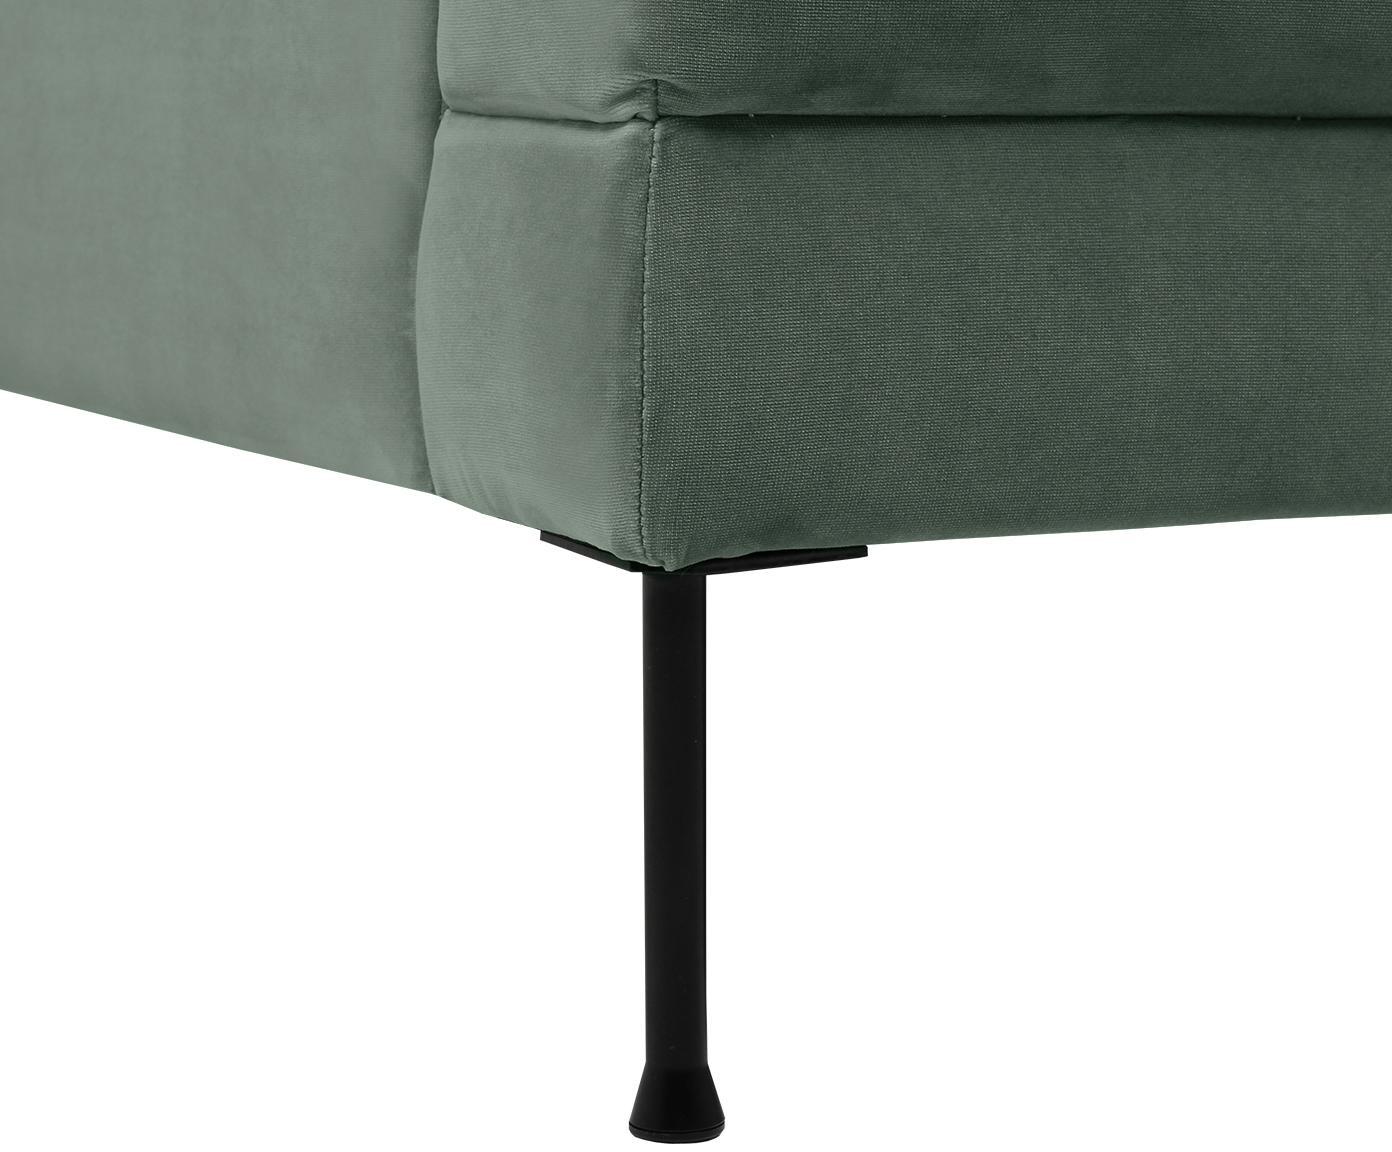 Fluwelen bank Fluente (2-zits), Bekleding: fluweel (hoogwaardig poly, Frame: massief grenenhout, Poten: gelakt metaal, Groen, B 168 x D 83 cm